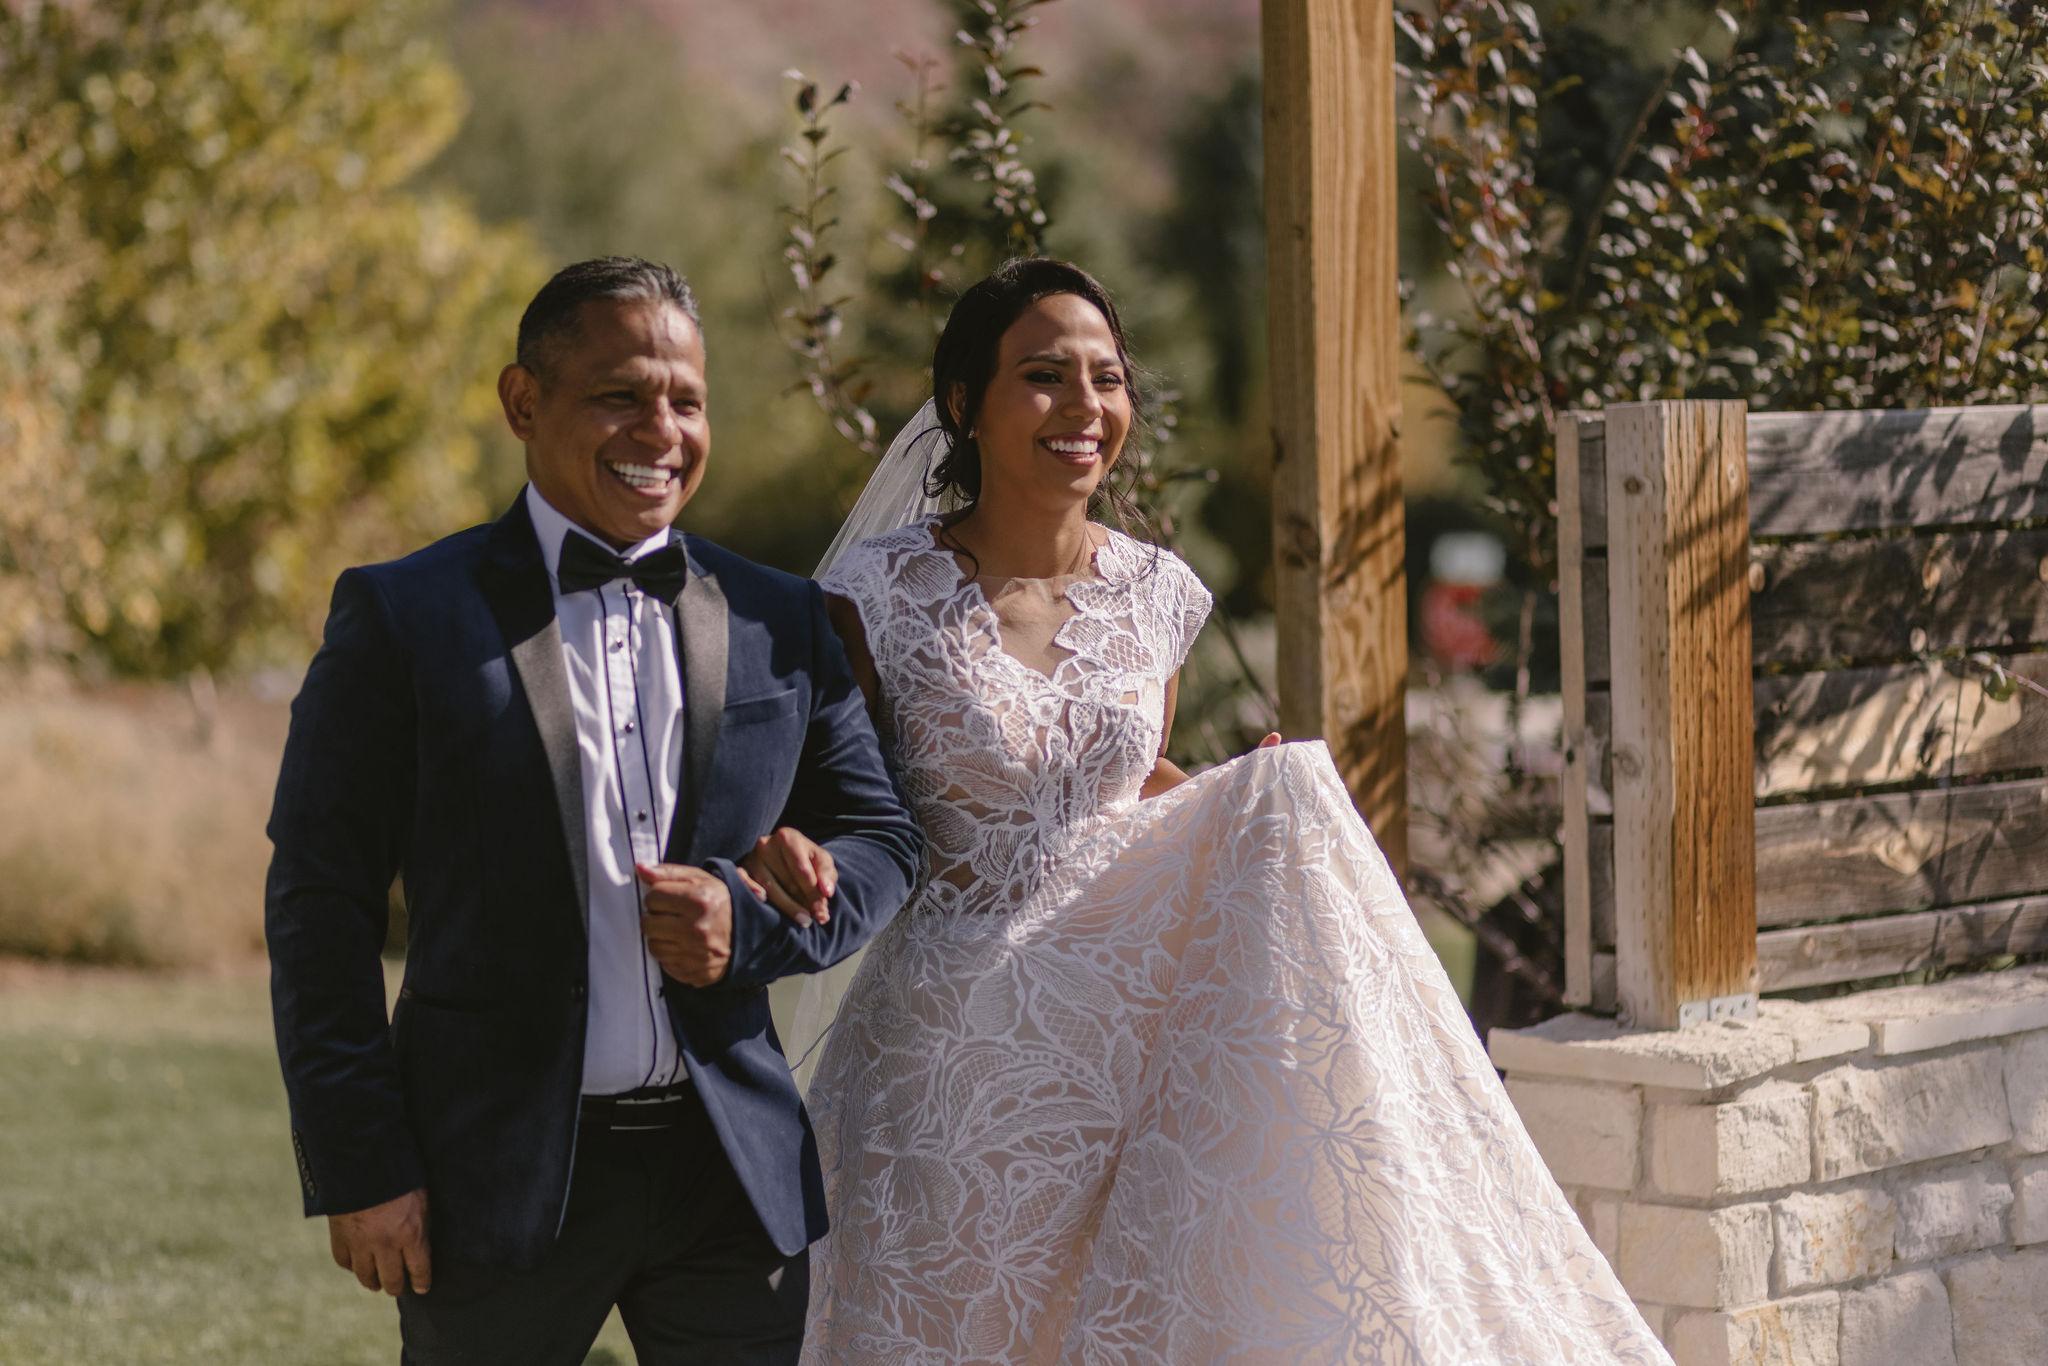 Modest Lace Wedding Dress Ballgown Backyard Summer Wedding Princess Kaiulani Tabernero 5